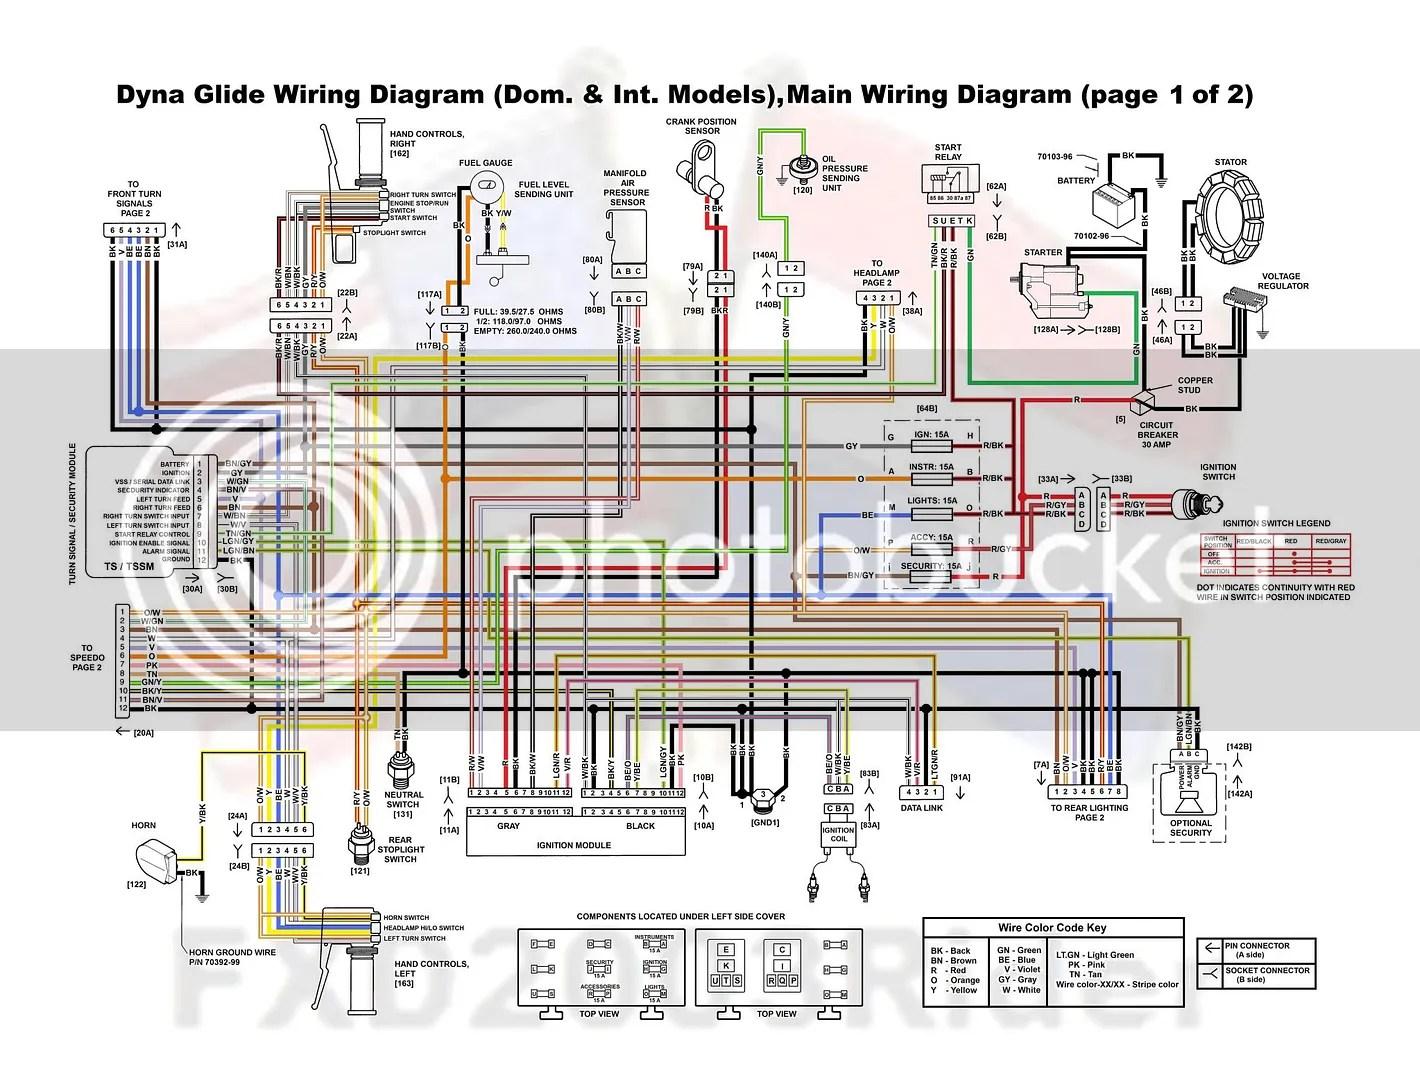 panhead wiring diagram panhead wiring diagram wiring diagram sitebasic harley panhead wiring diagram harley ignition wiring diagram harley davidson wiring diagrams 1988 wiring diagram